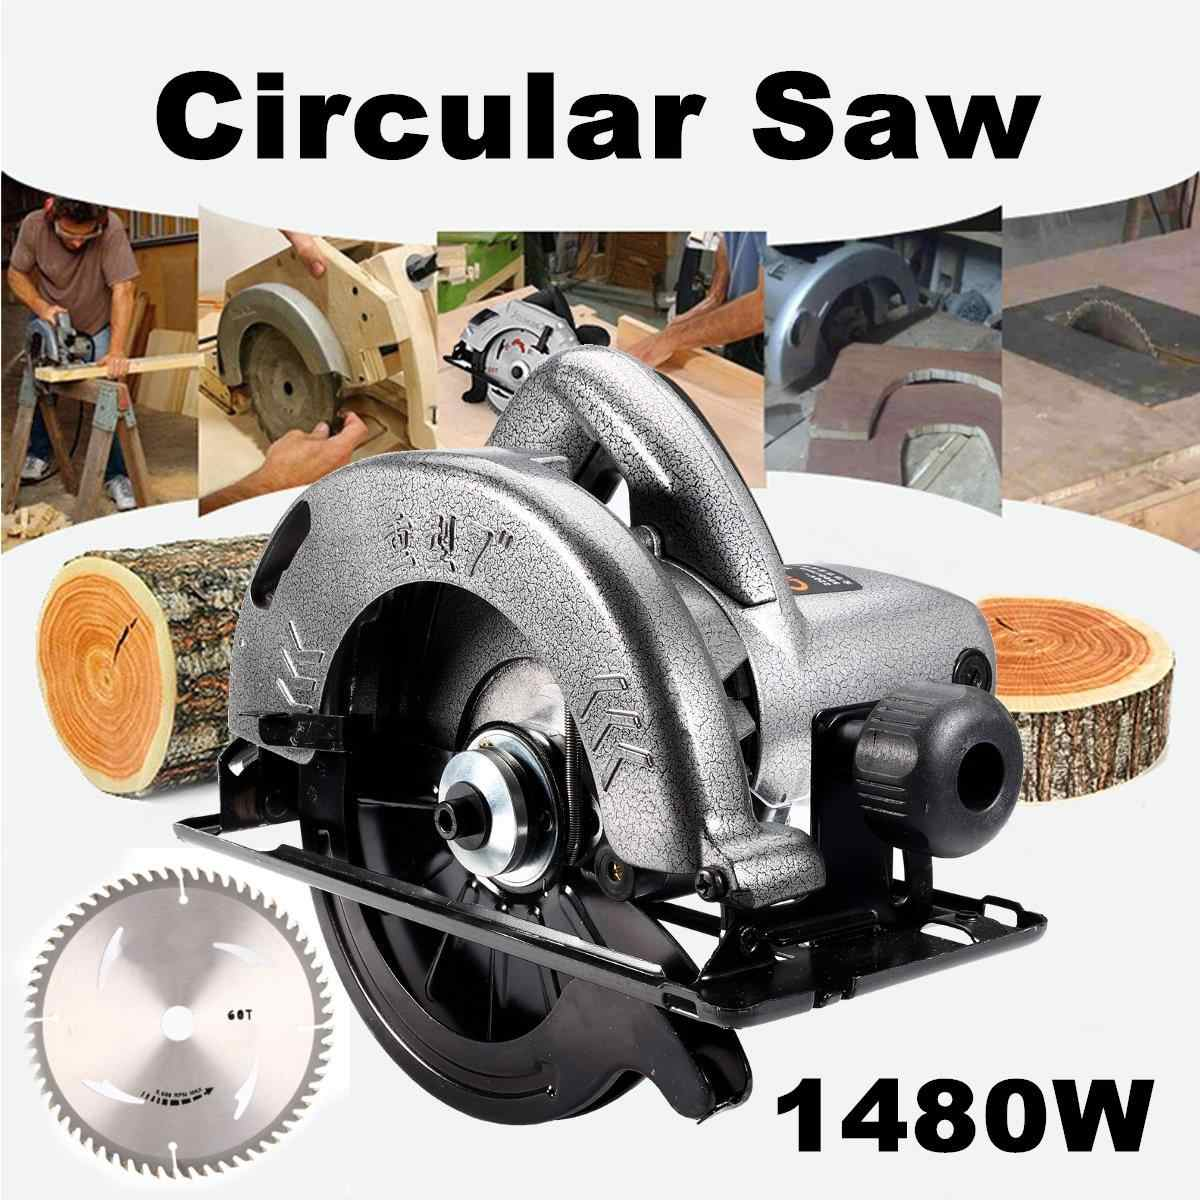 Listrik 1480W Dijalin Dgn Tali Circular Saw Pemotong Kayu Alat Multi-Fungsi Mesin Pemotong Woodworking DIY Model Rumah Tangga Circular Saw